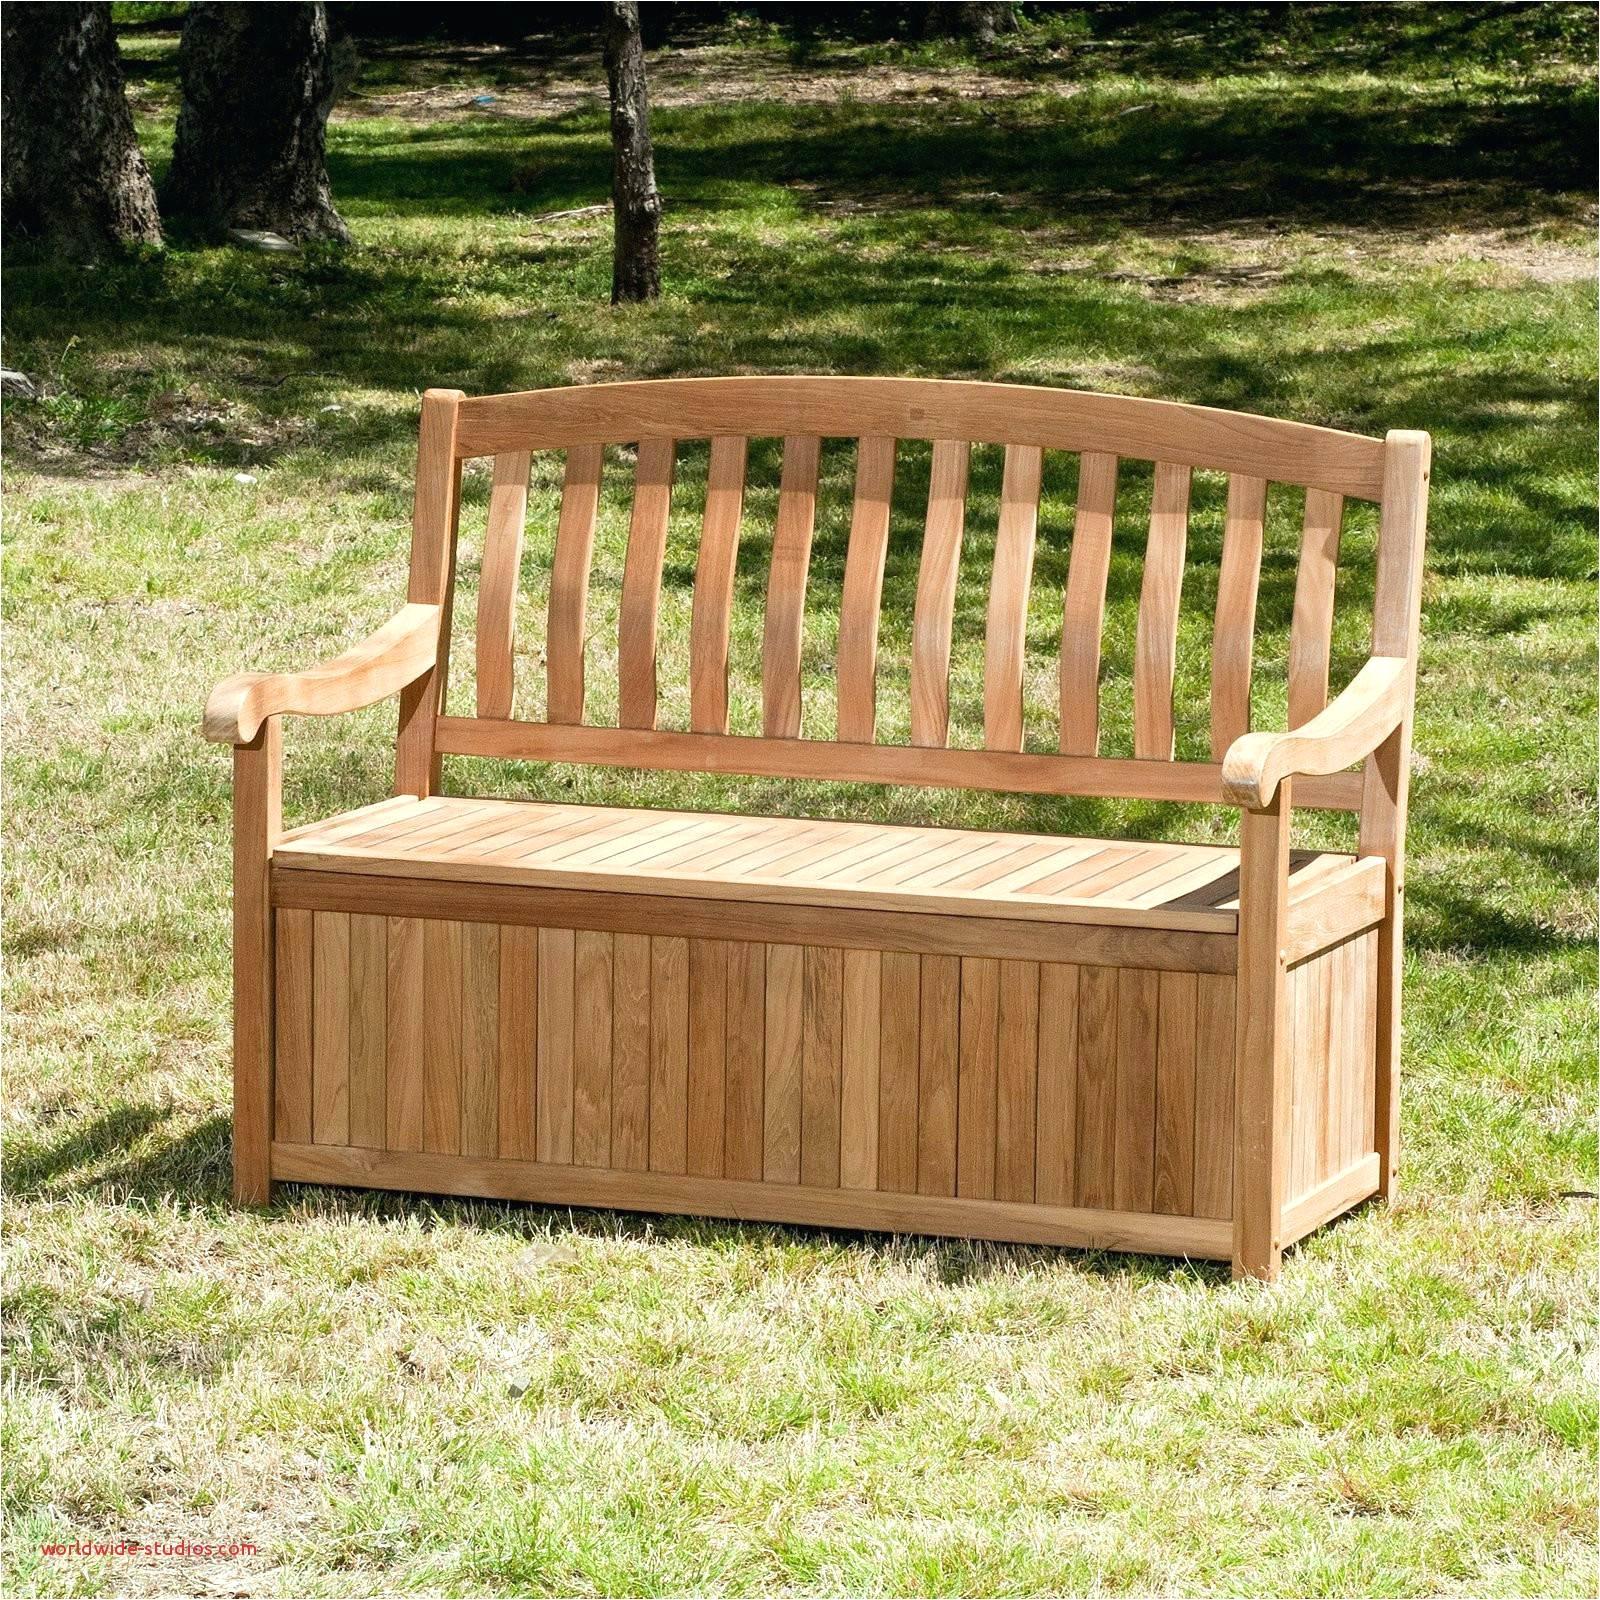 2×4 Patio Furniture Plans 2×4 Bench Plans Elegant Enchanting Workshop Bench  Plans